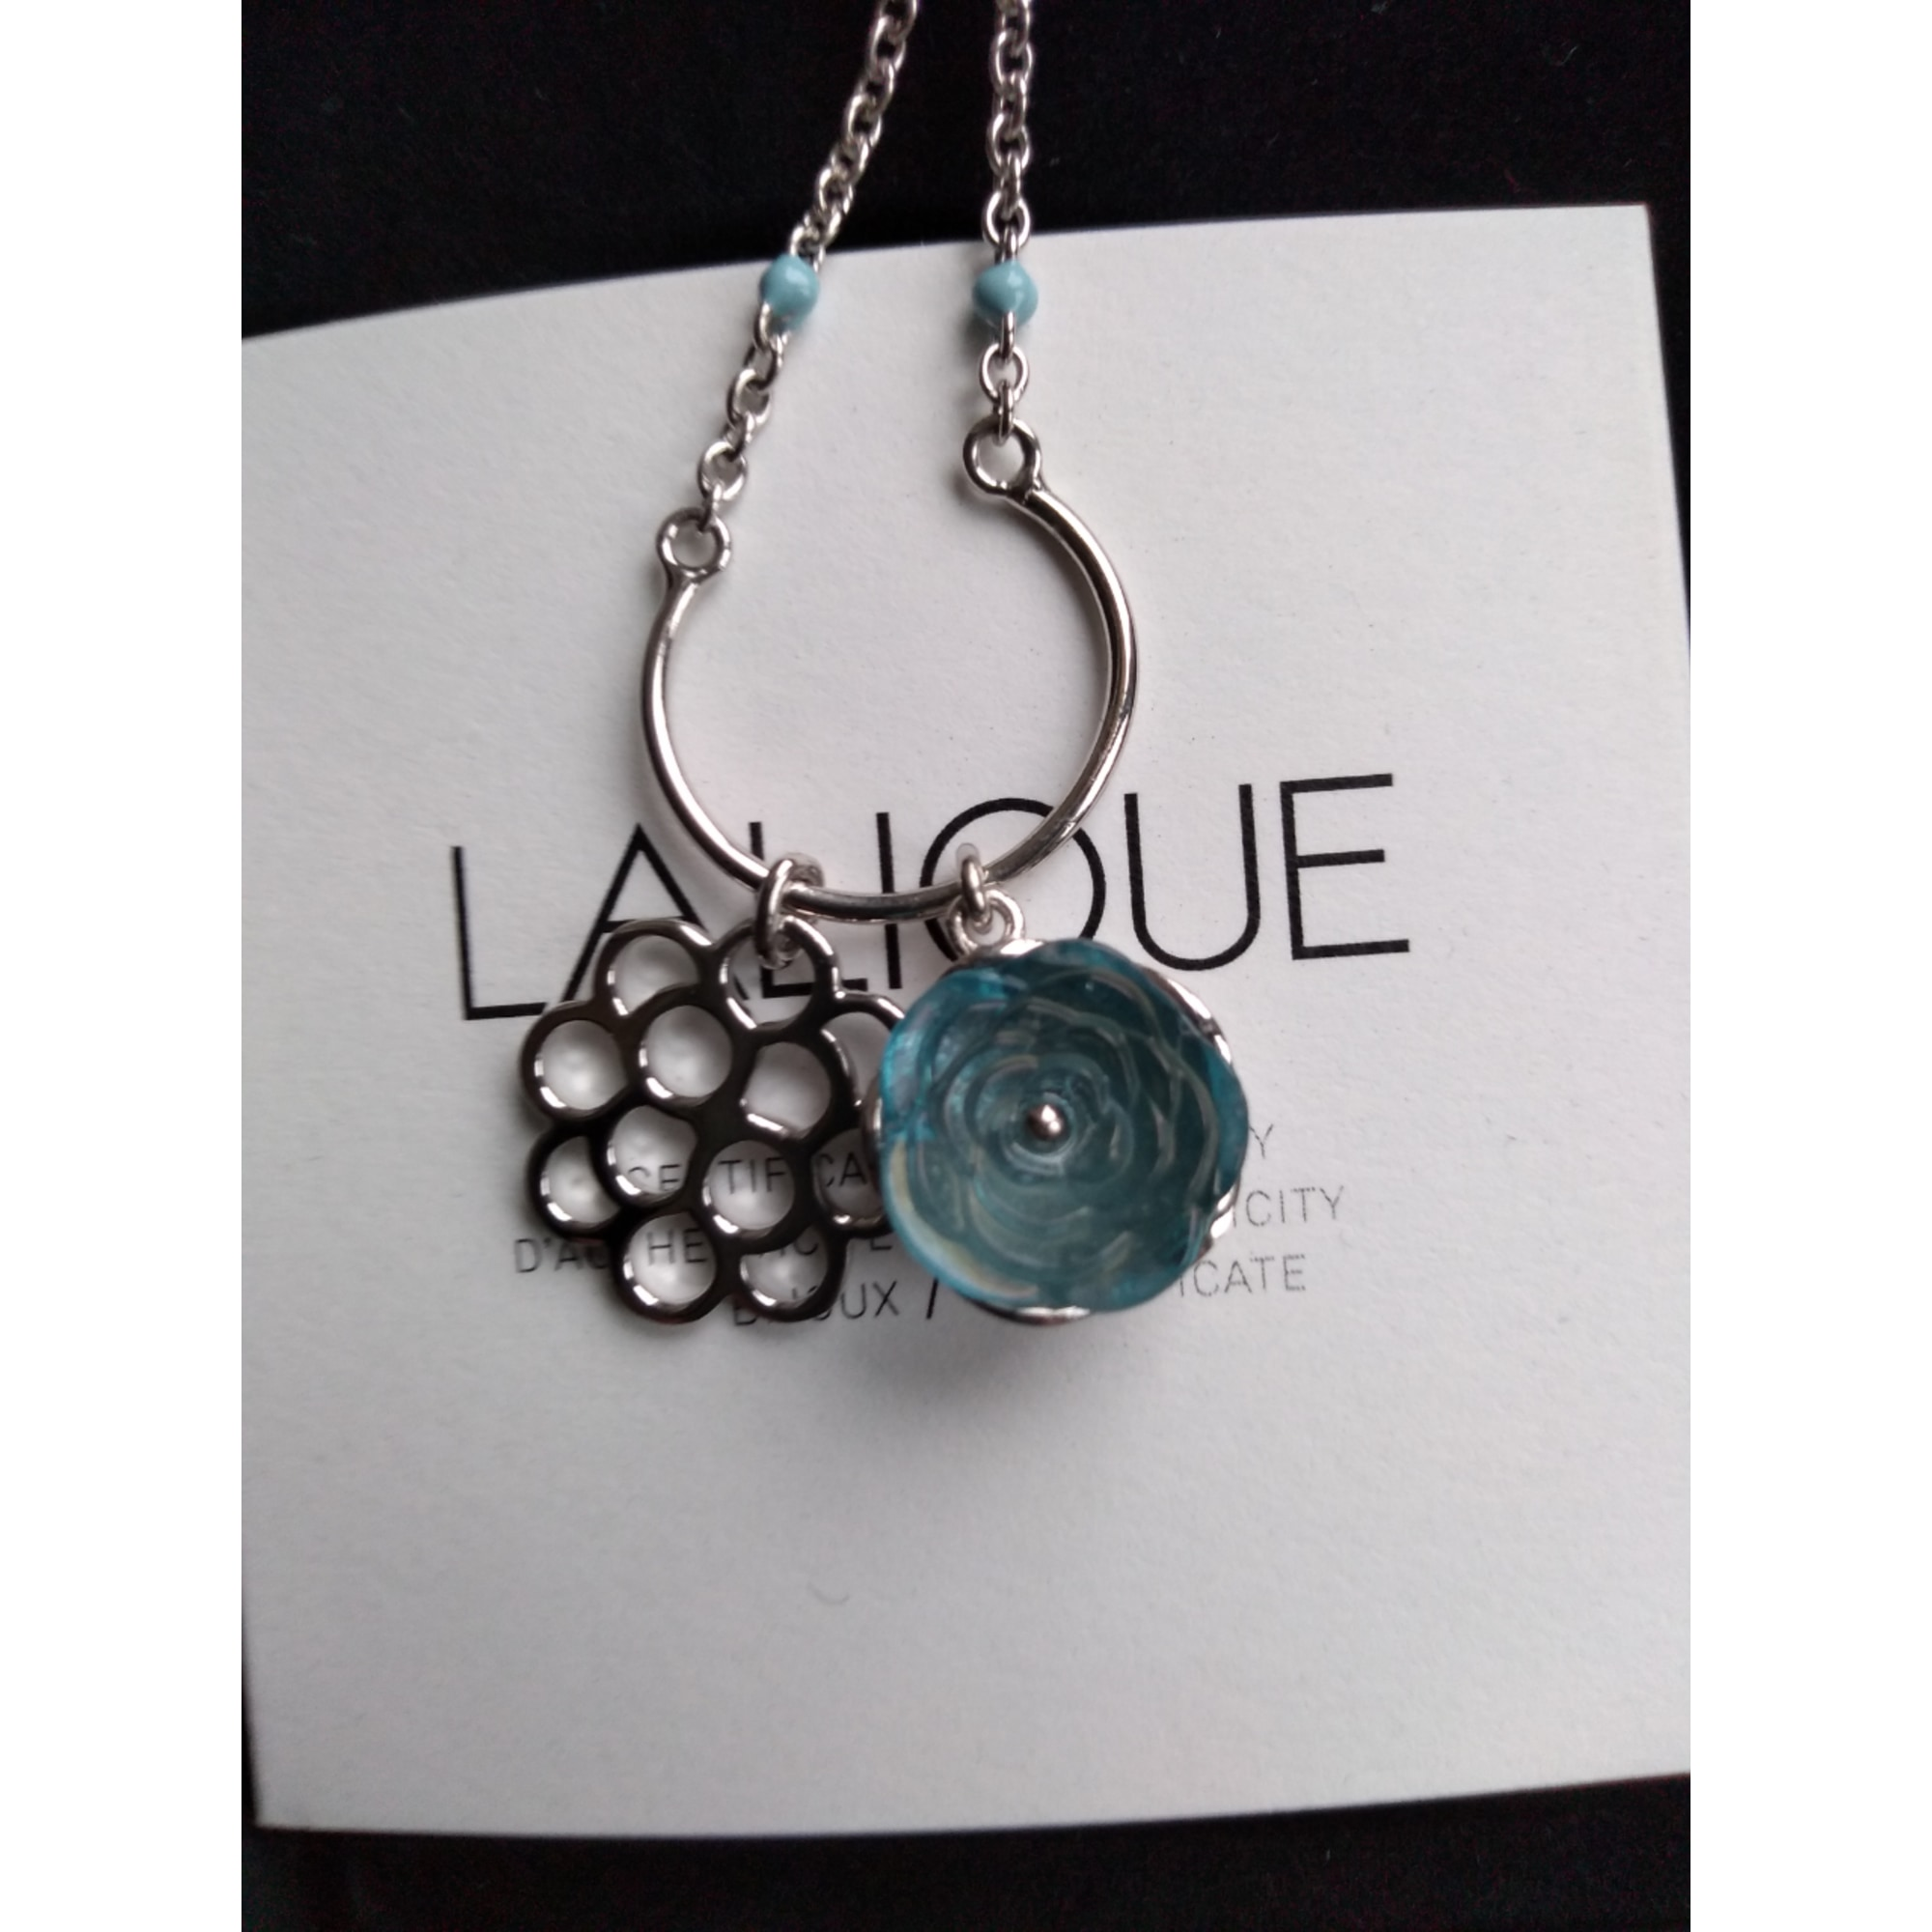 Pendentif, collier pendentif LALIQUE Bleu, bleu marine, bleu turquoise